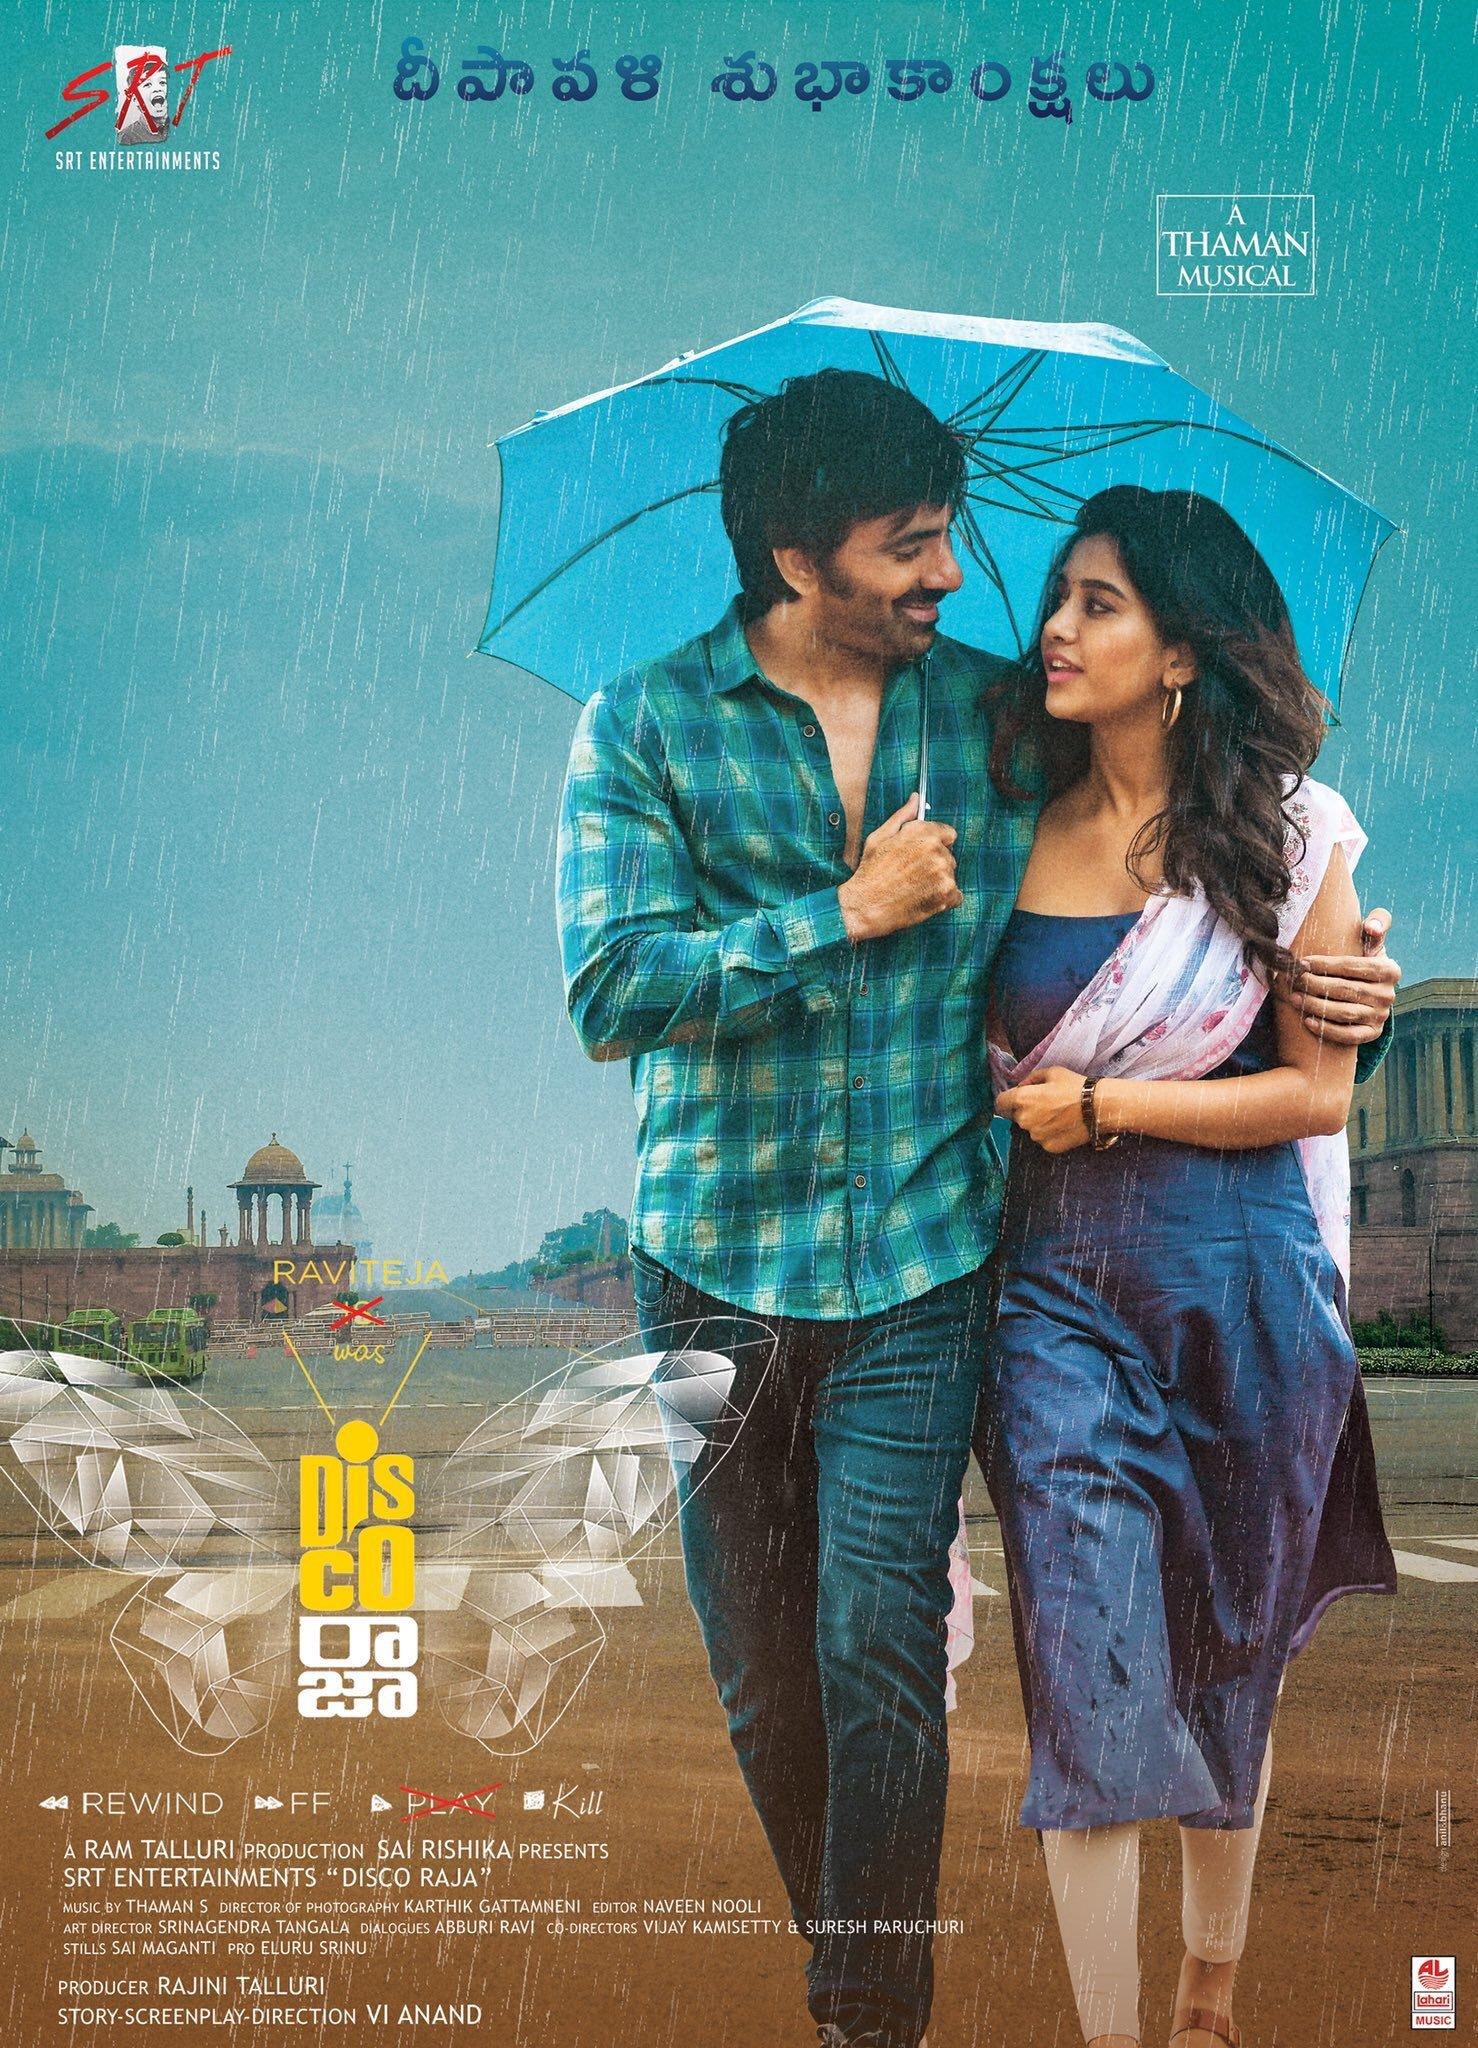 Disco Raja (2020) Hindi Dubbed